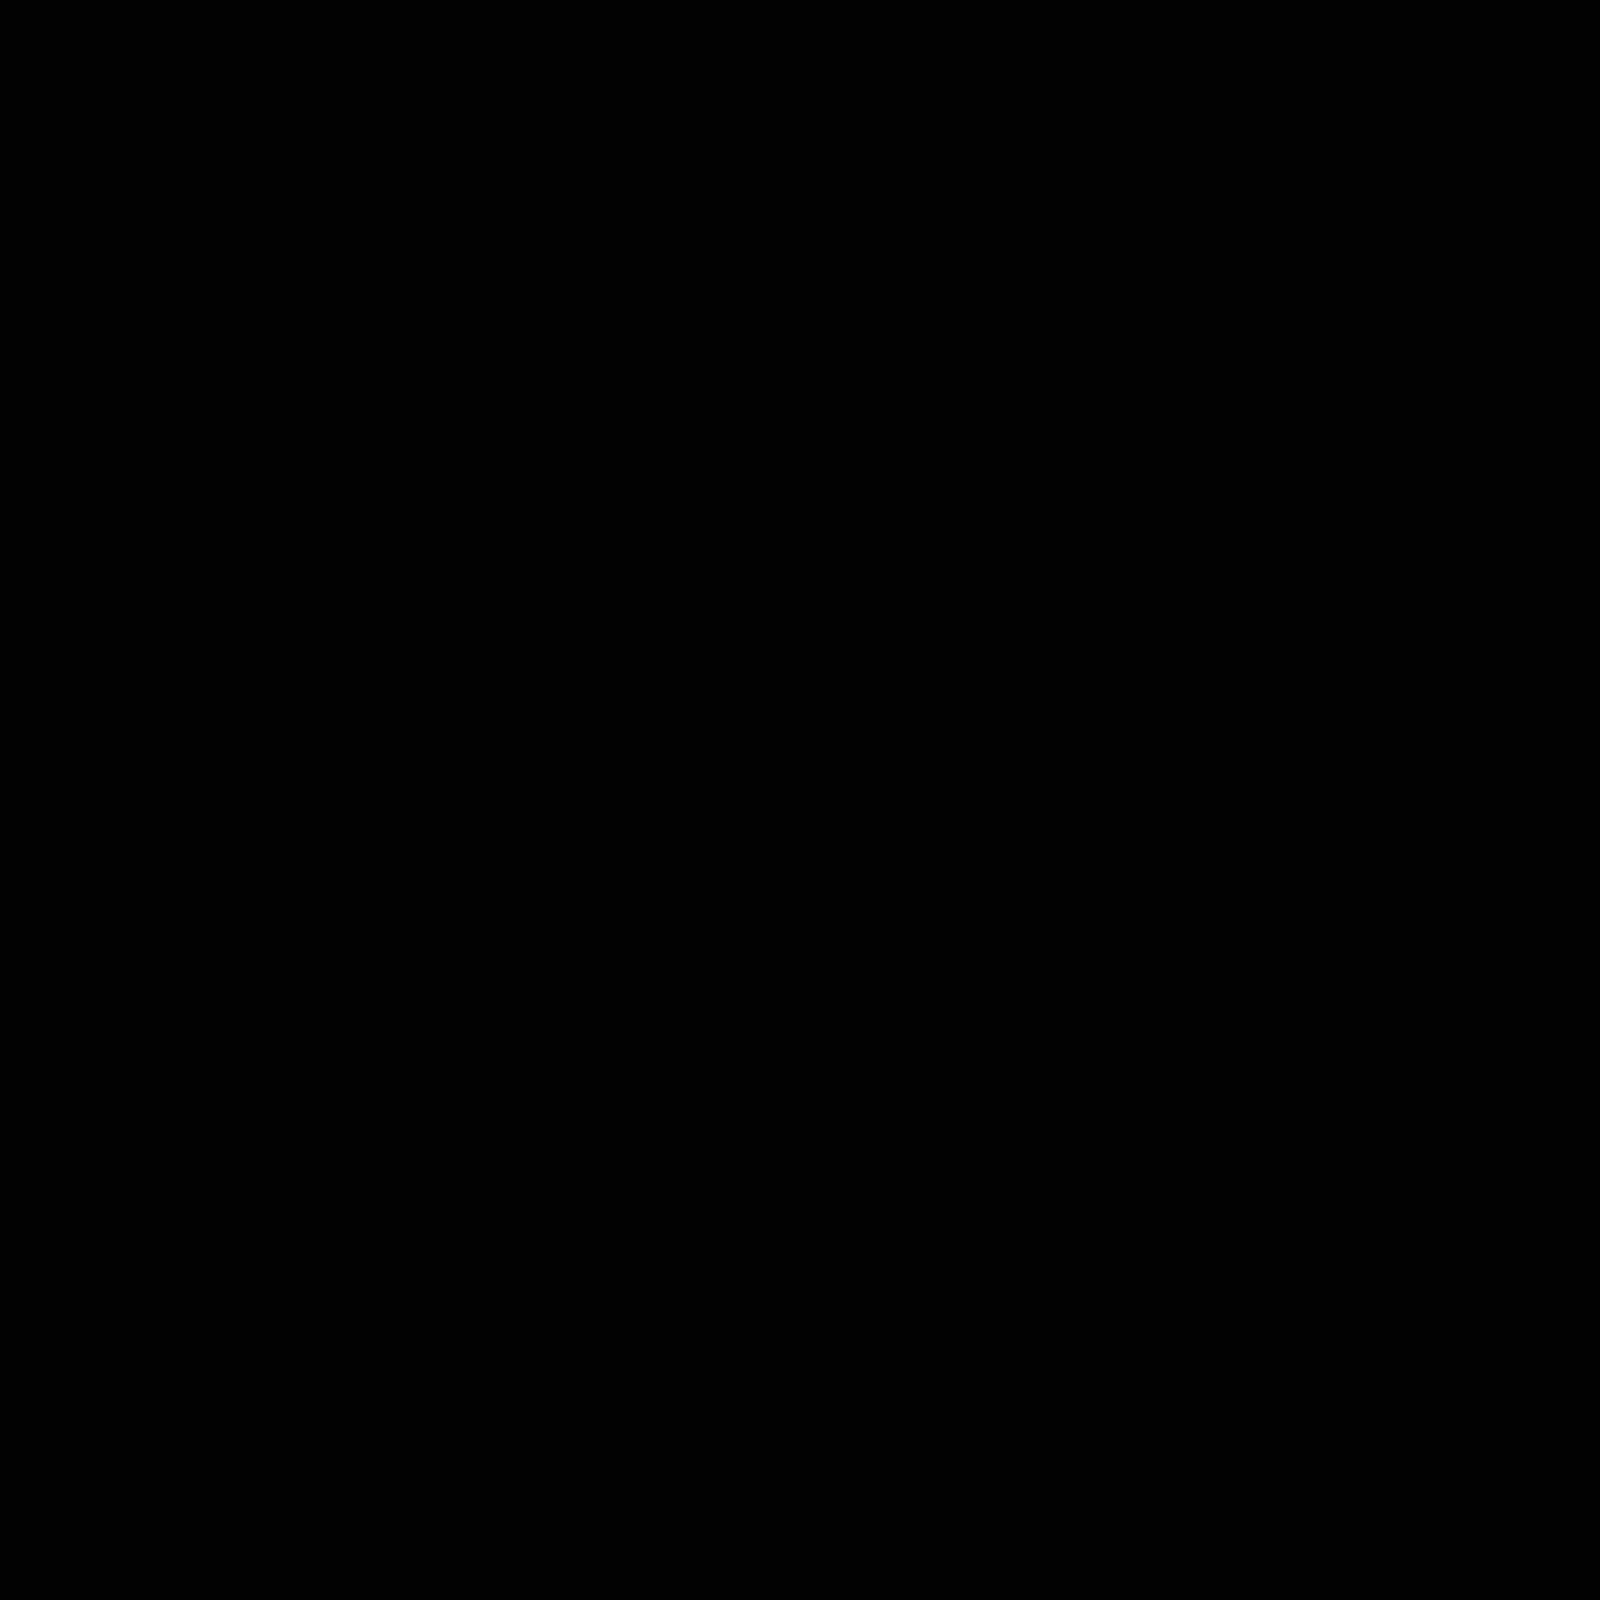 Petrol icon